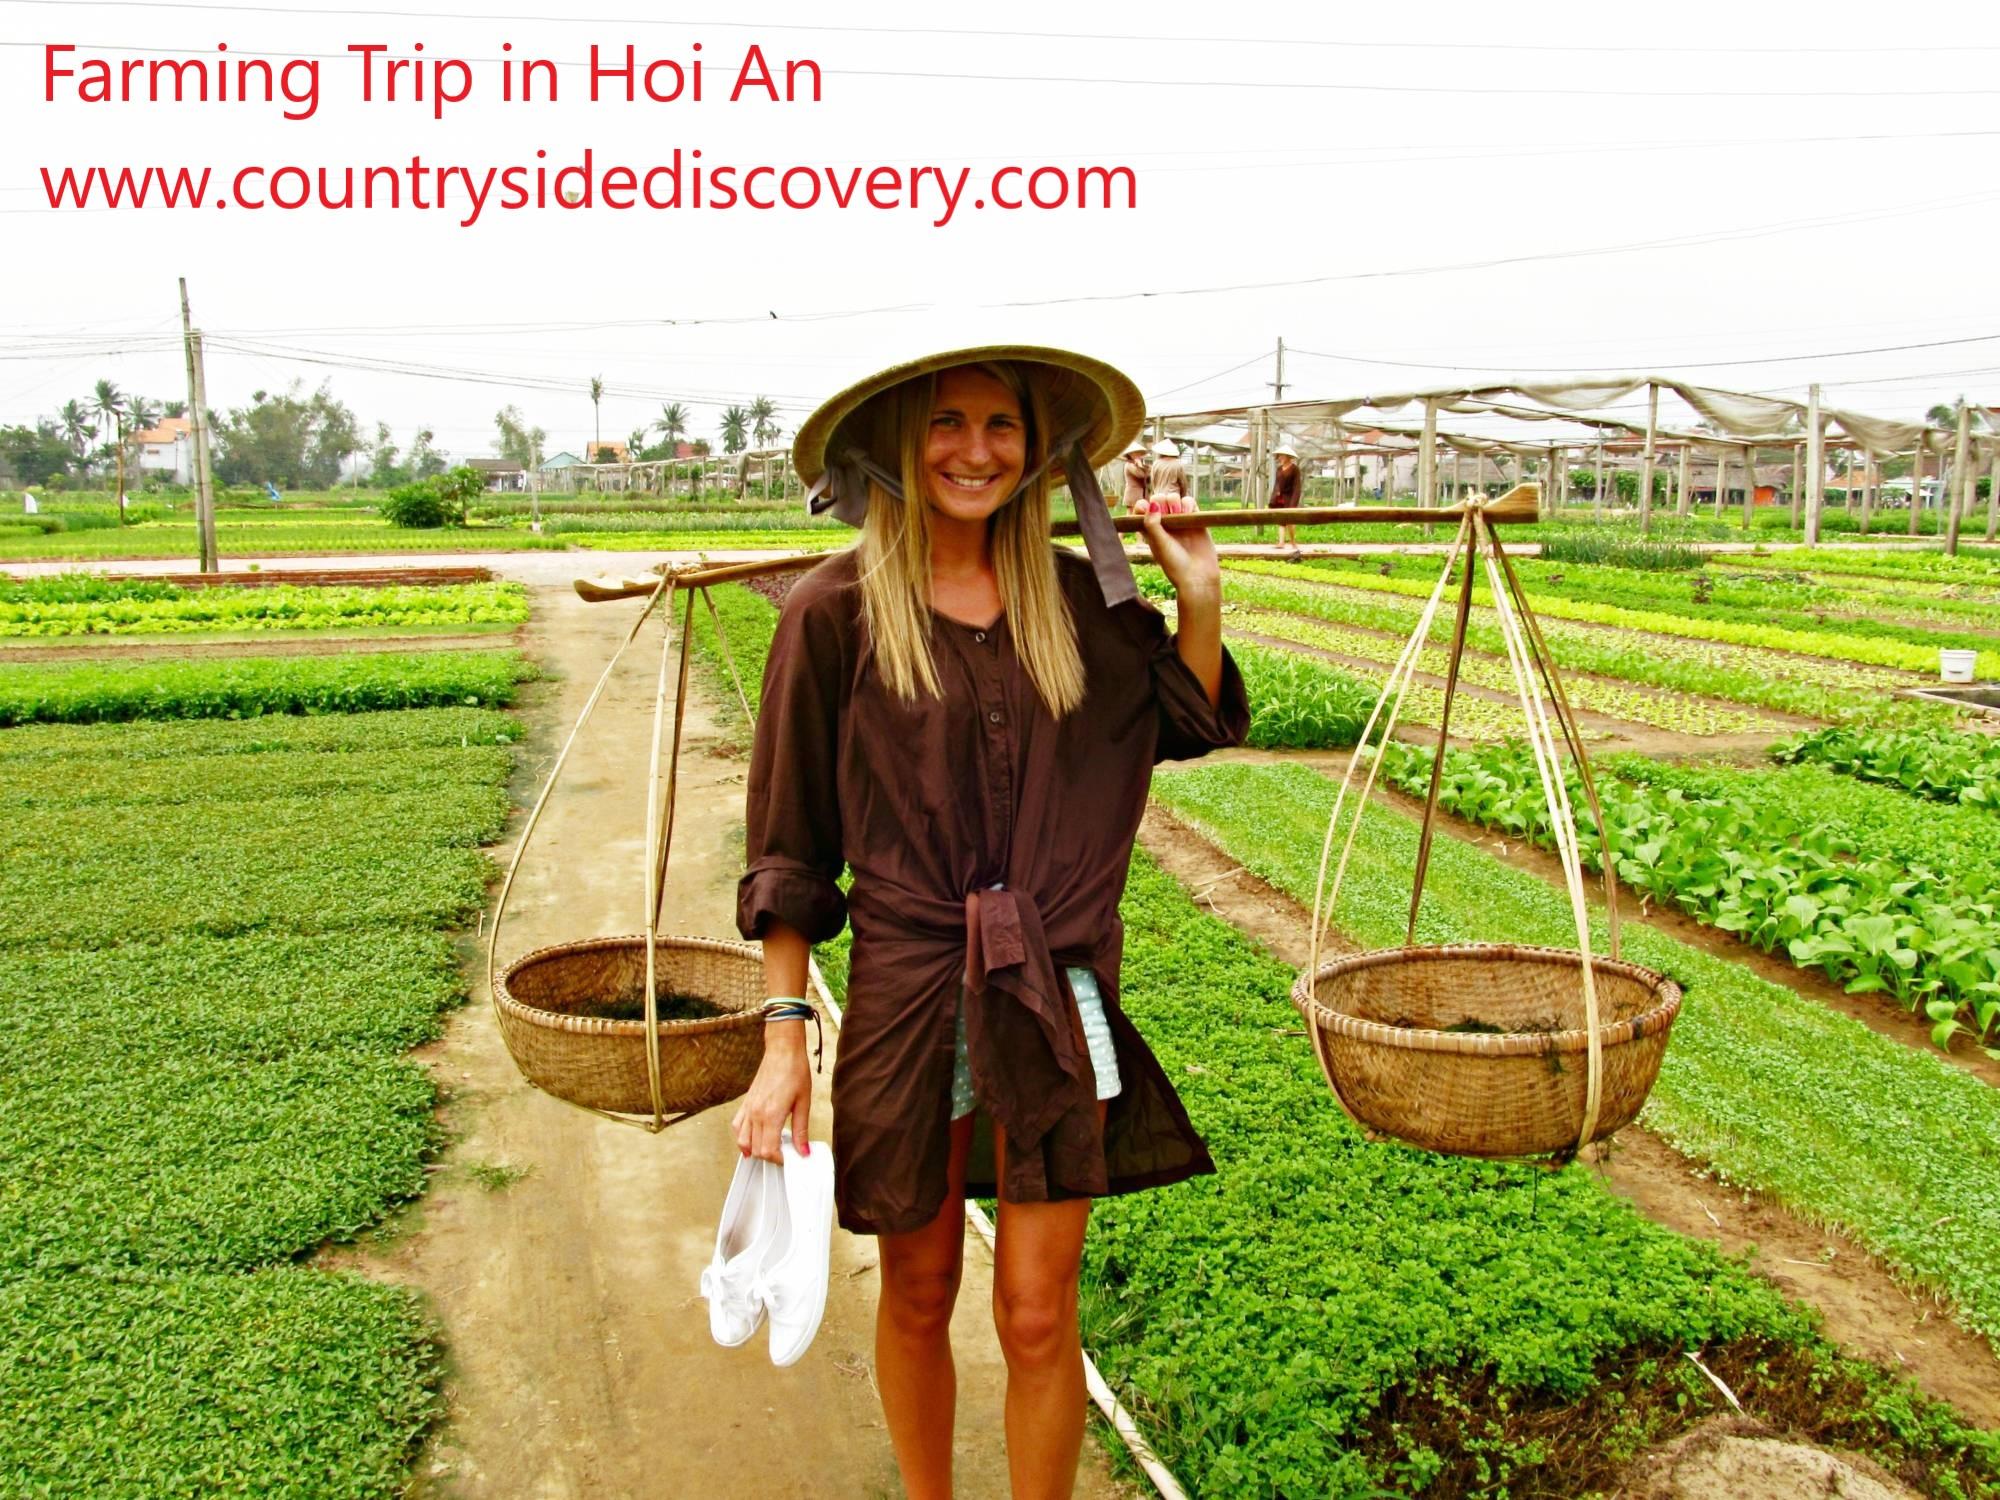 Vietnam & Cambodia Hidden Charm Experience